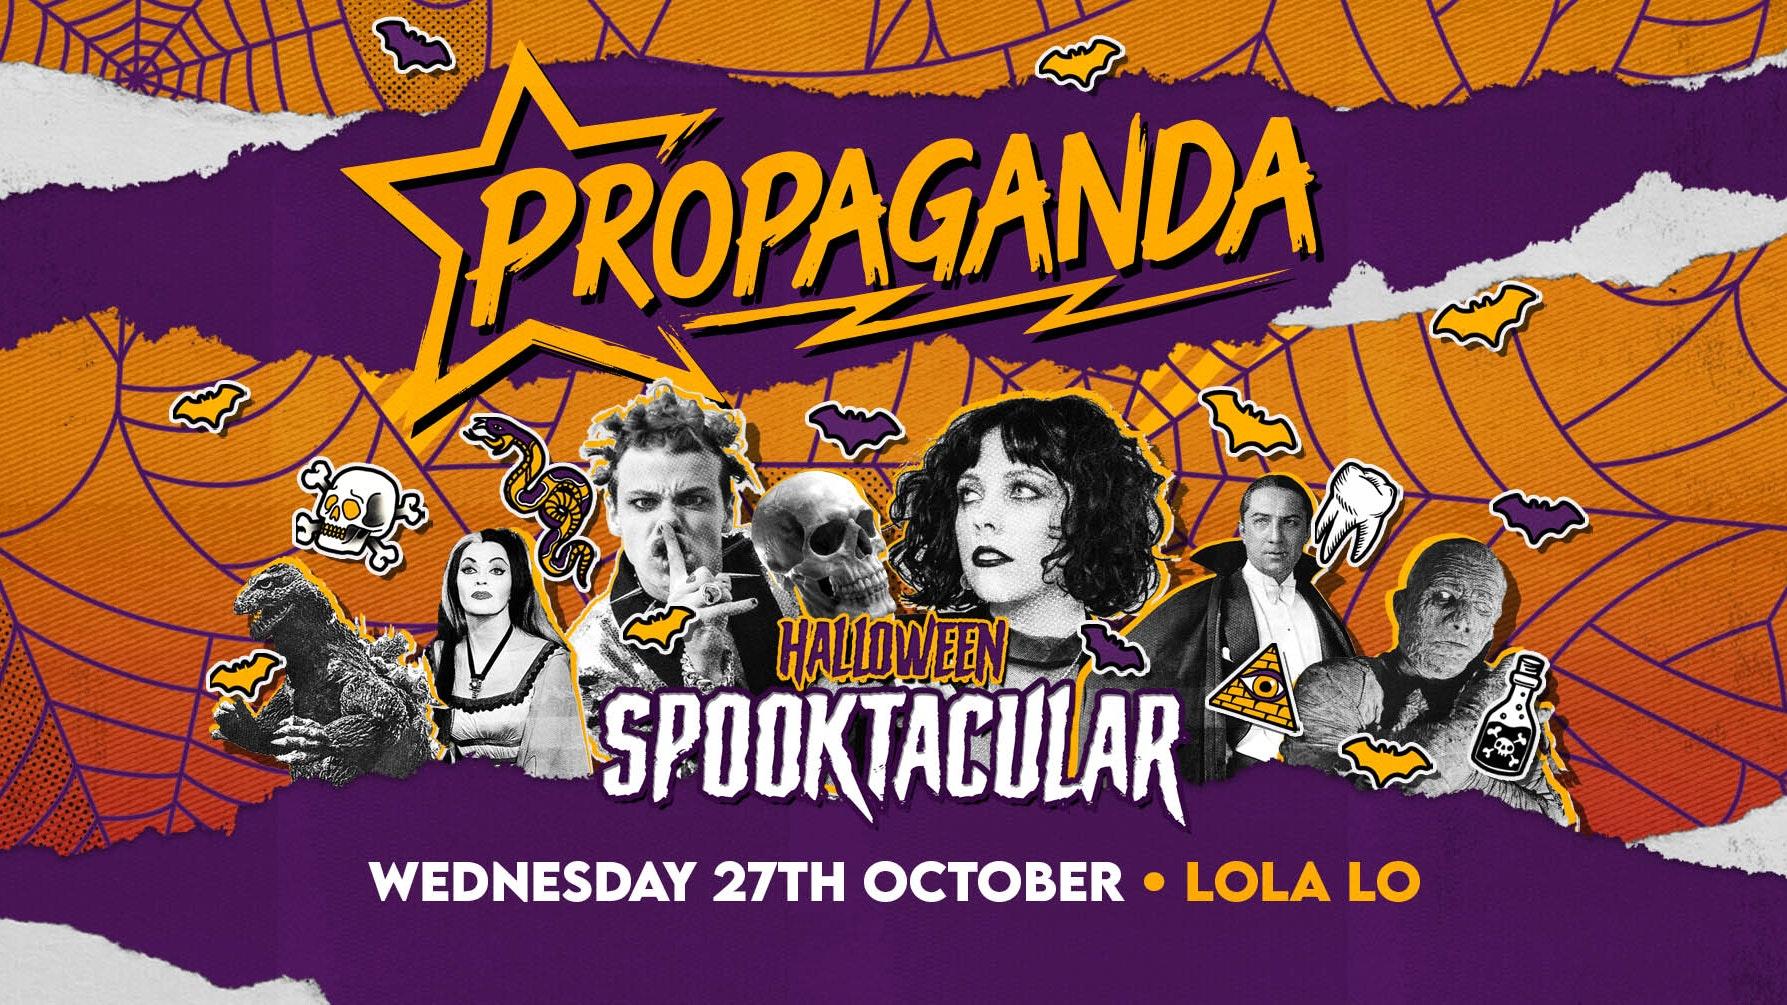 Propaganda Cambridge – Halloween Spooktacular!